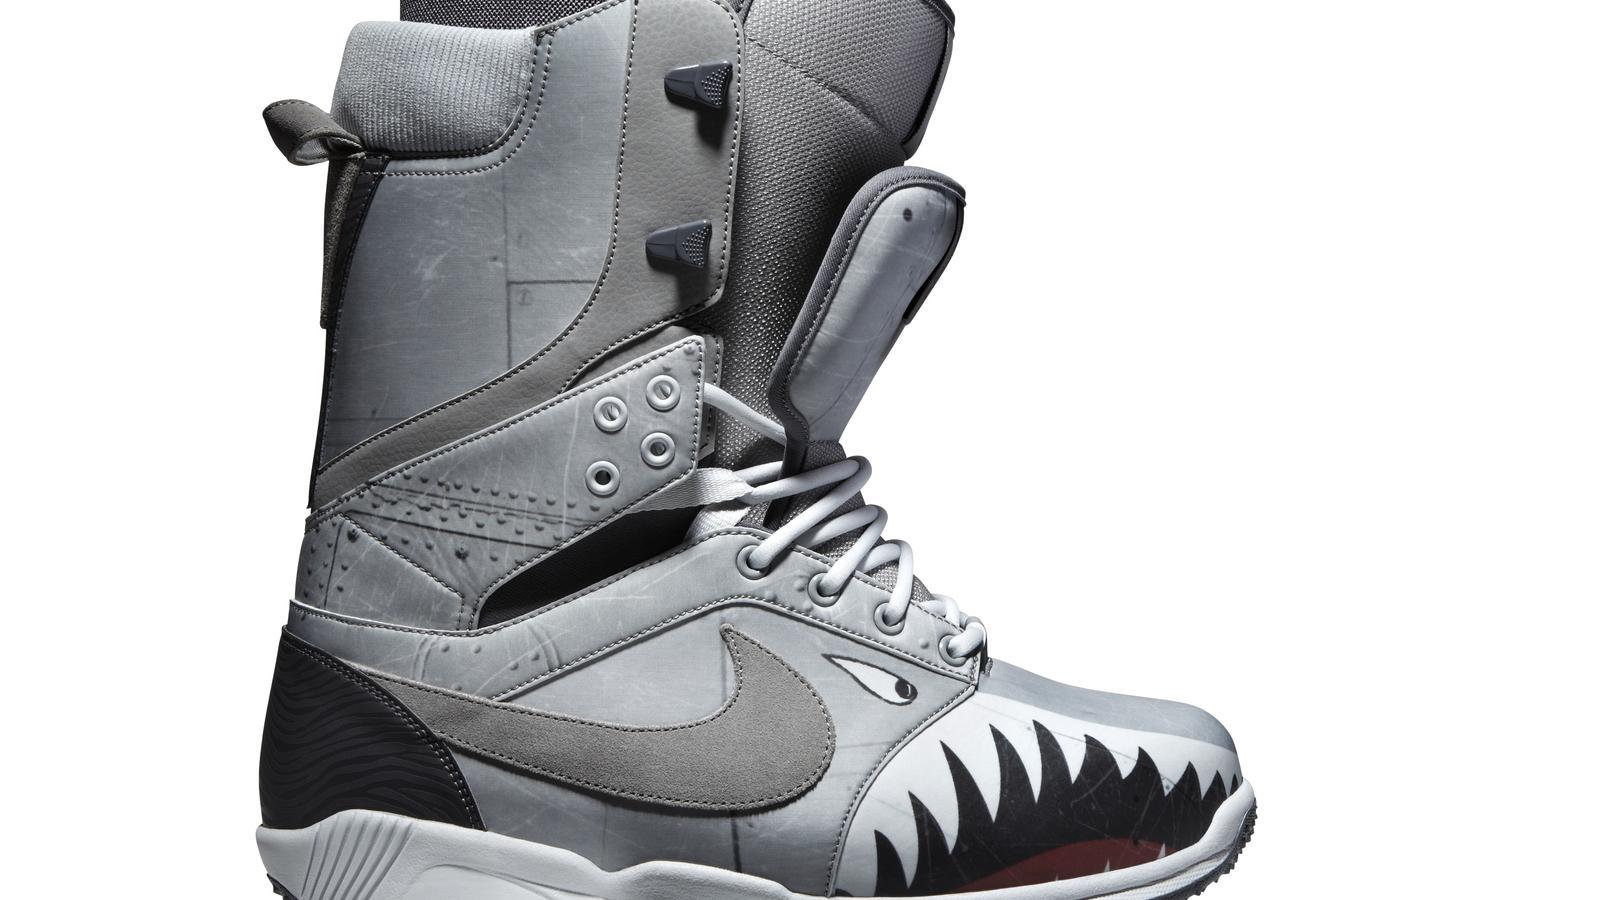 f1496f486fed5d Nike Air Jordan 23 Dentro Low